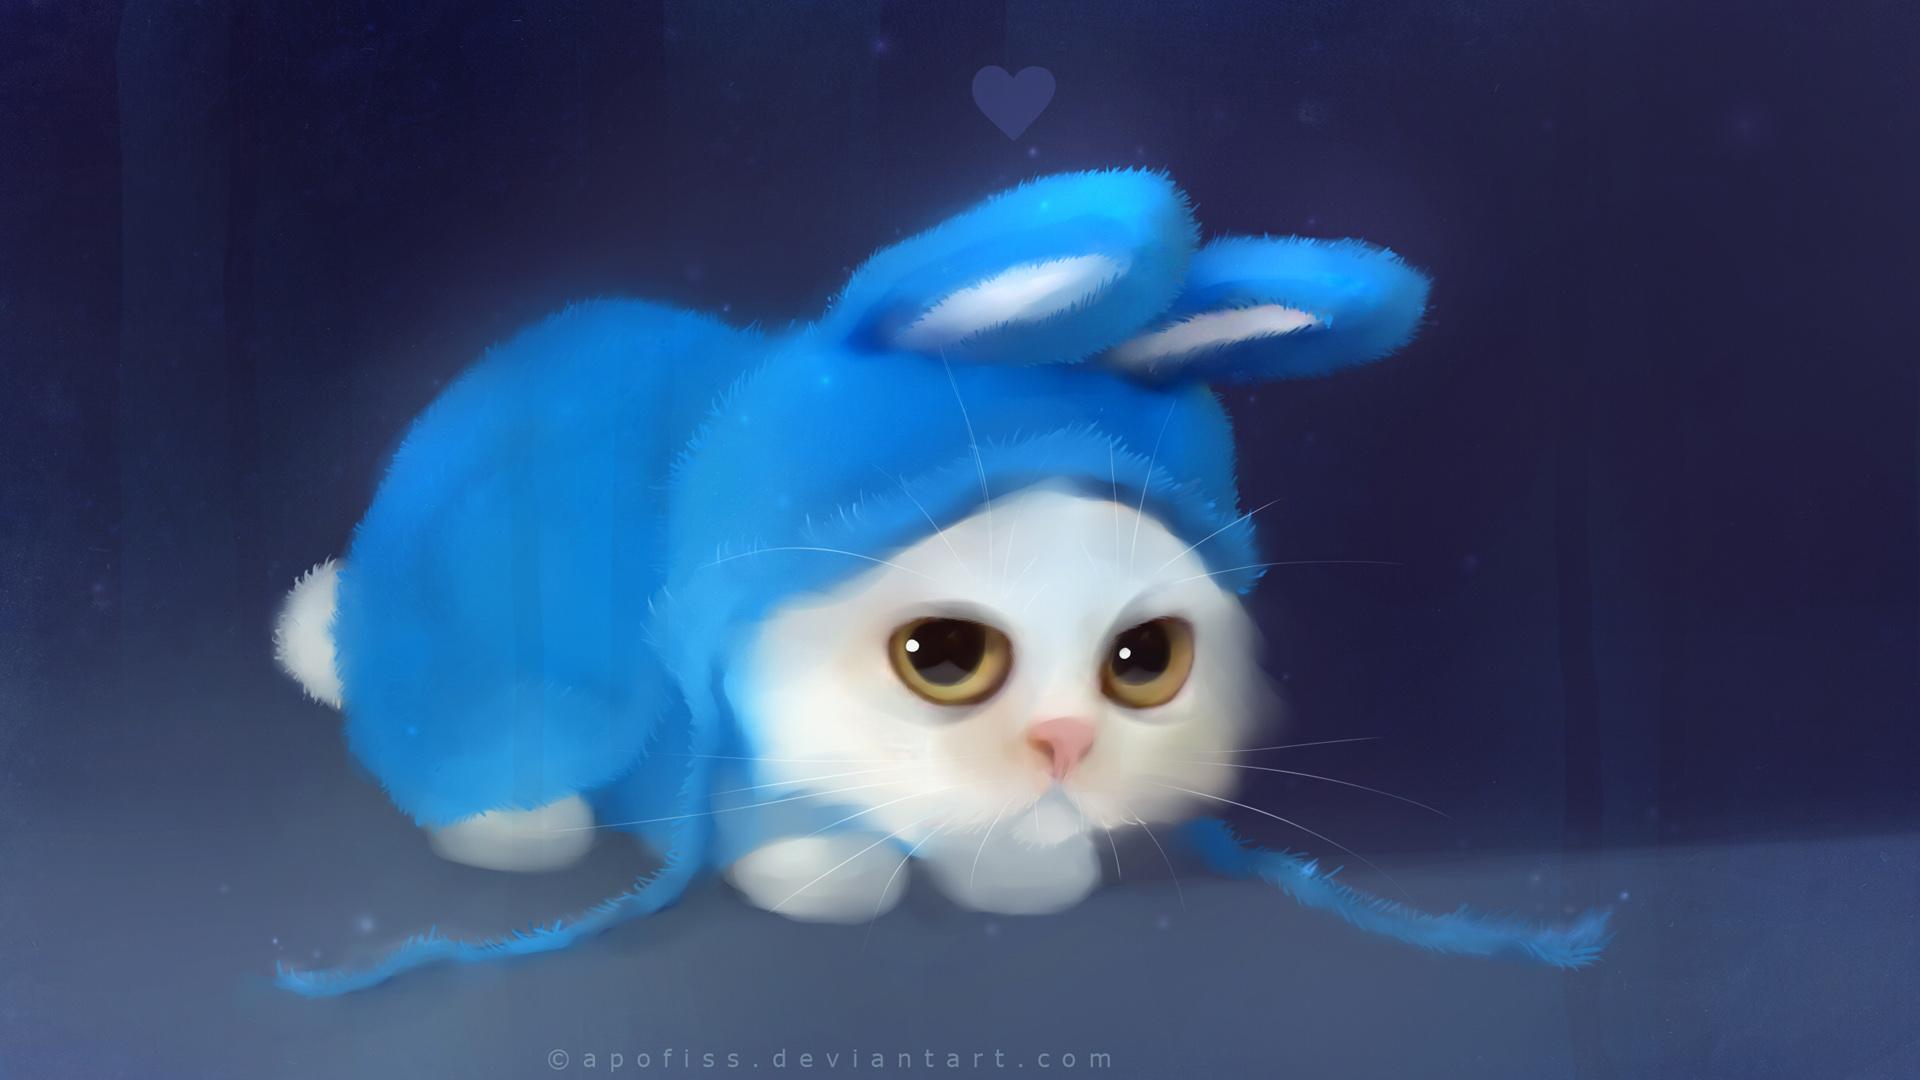 Cute Blue Bunny - Cute Blue Bunny